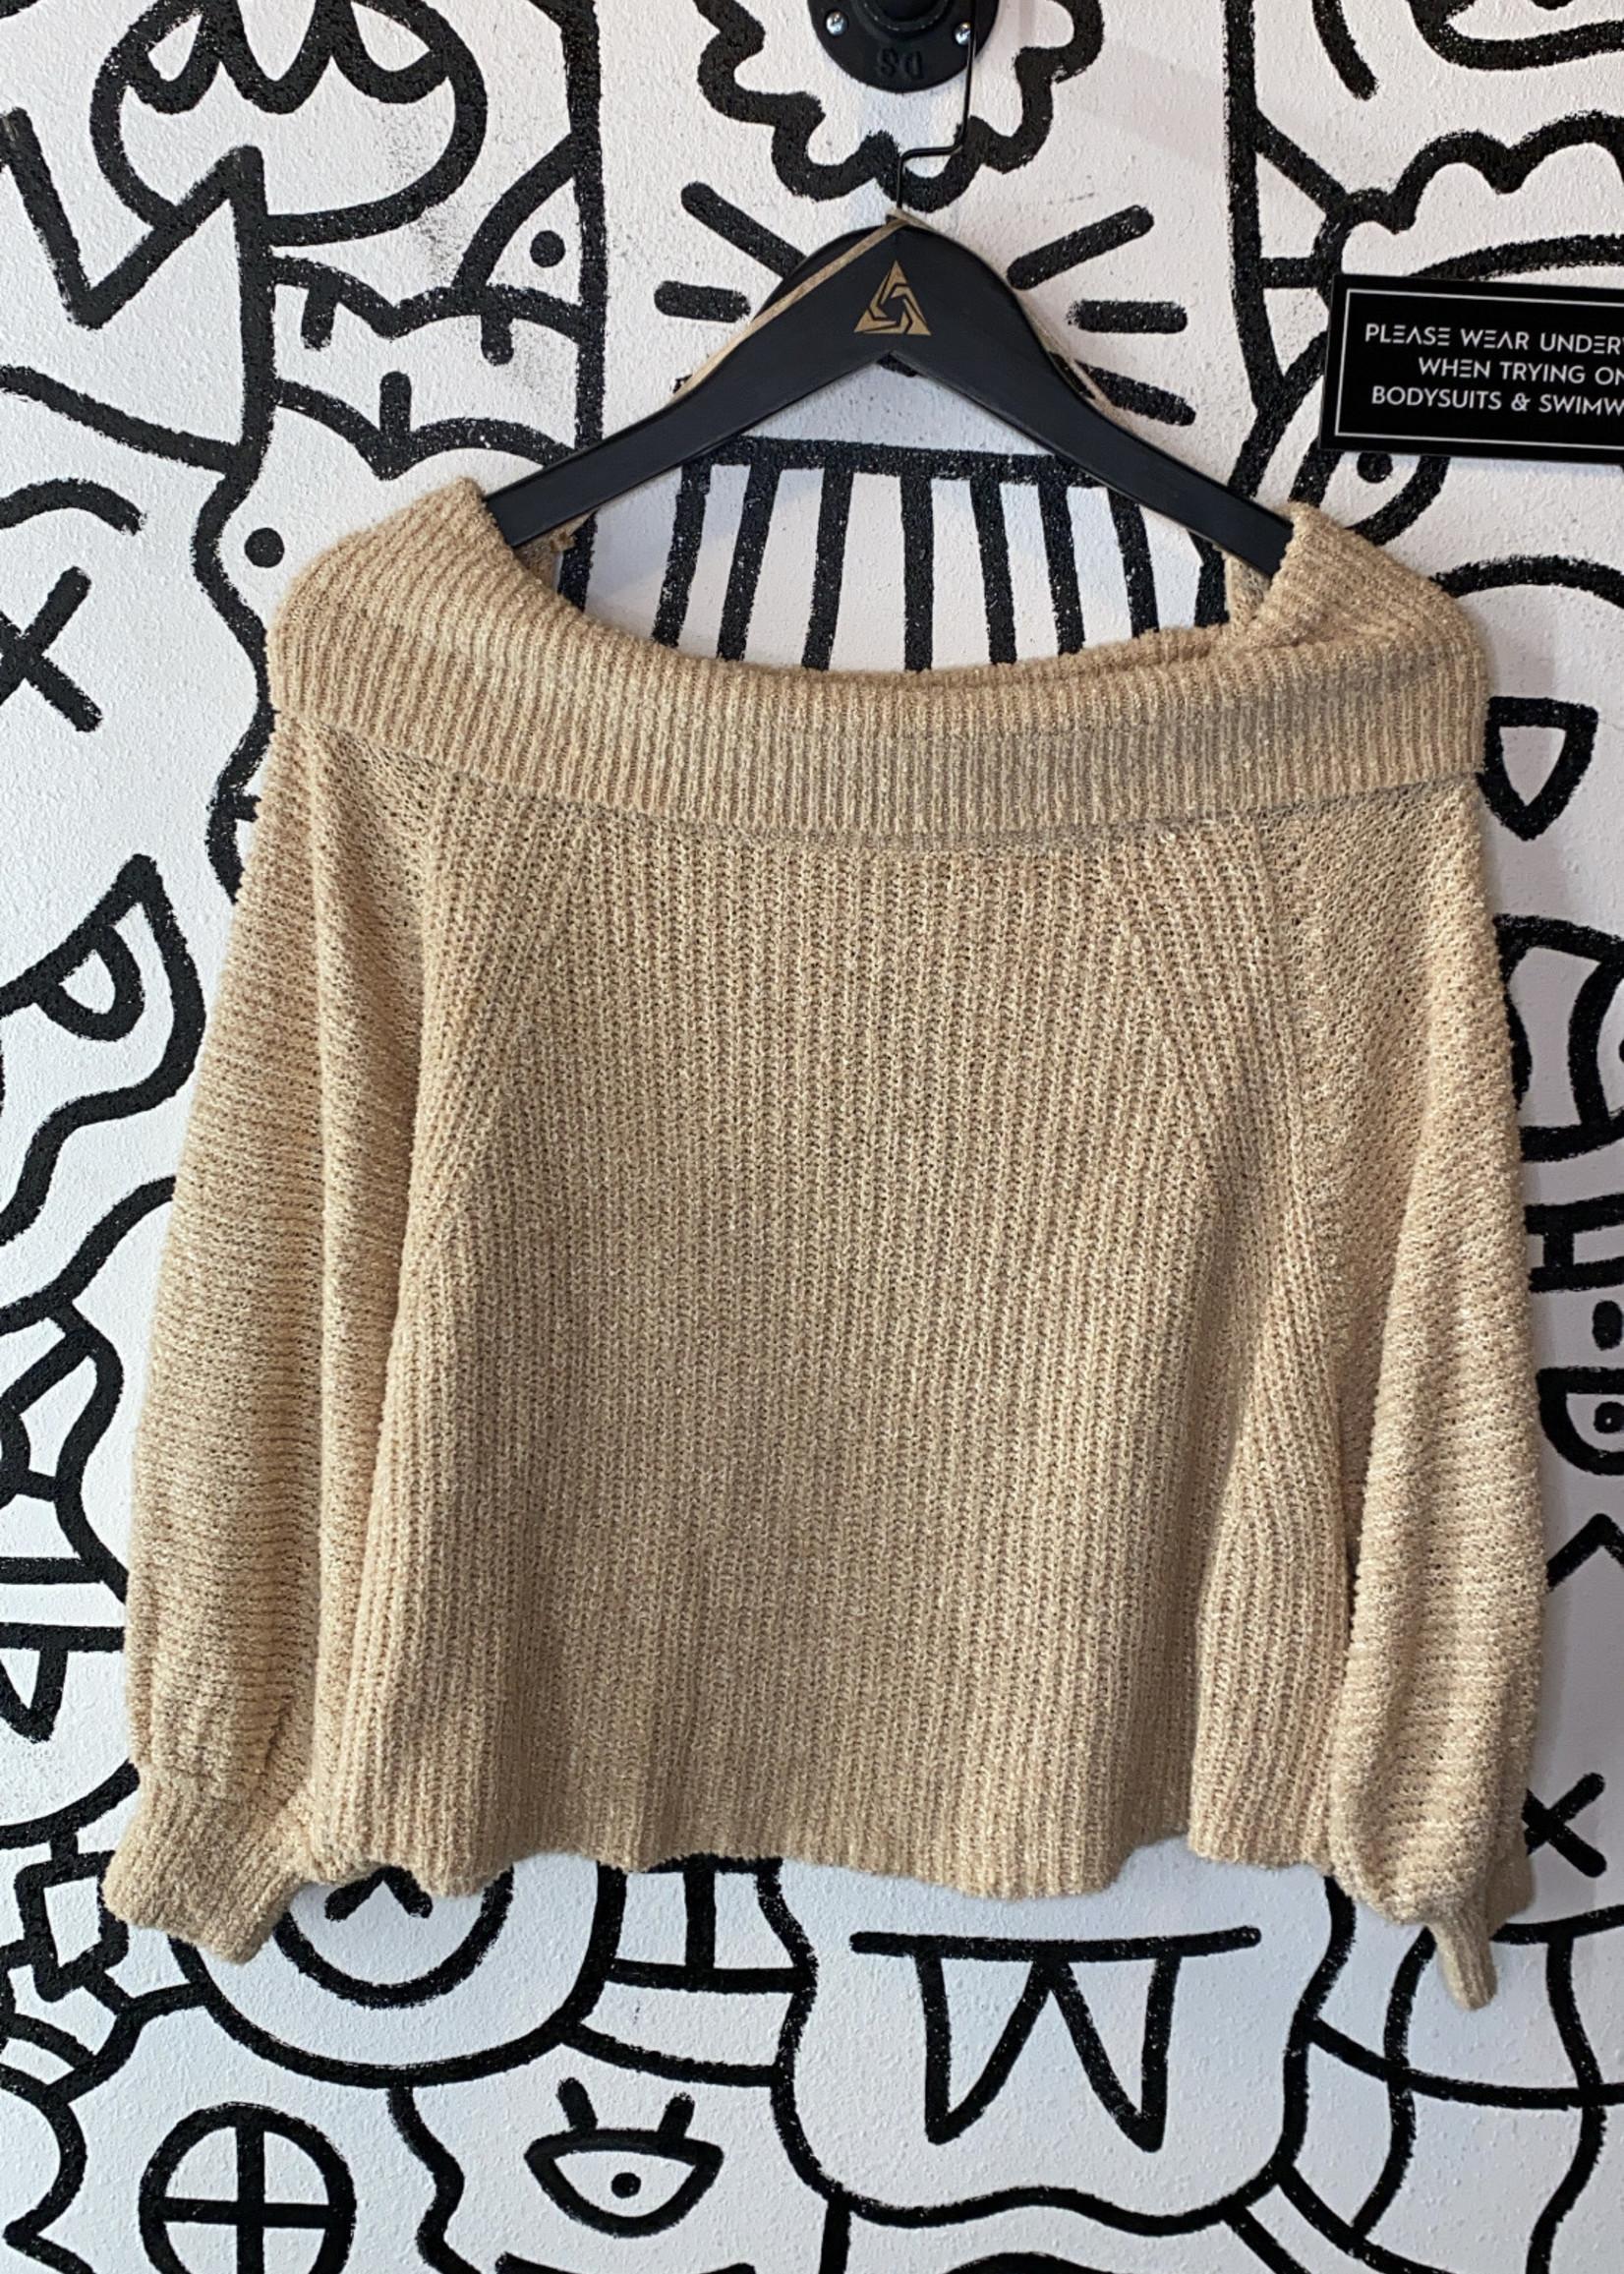 Free Peope Beige Knit 3/4 Sleeve Sweater S